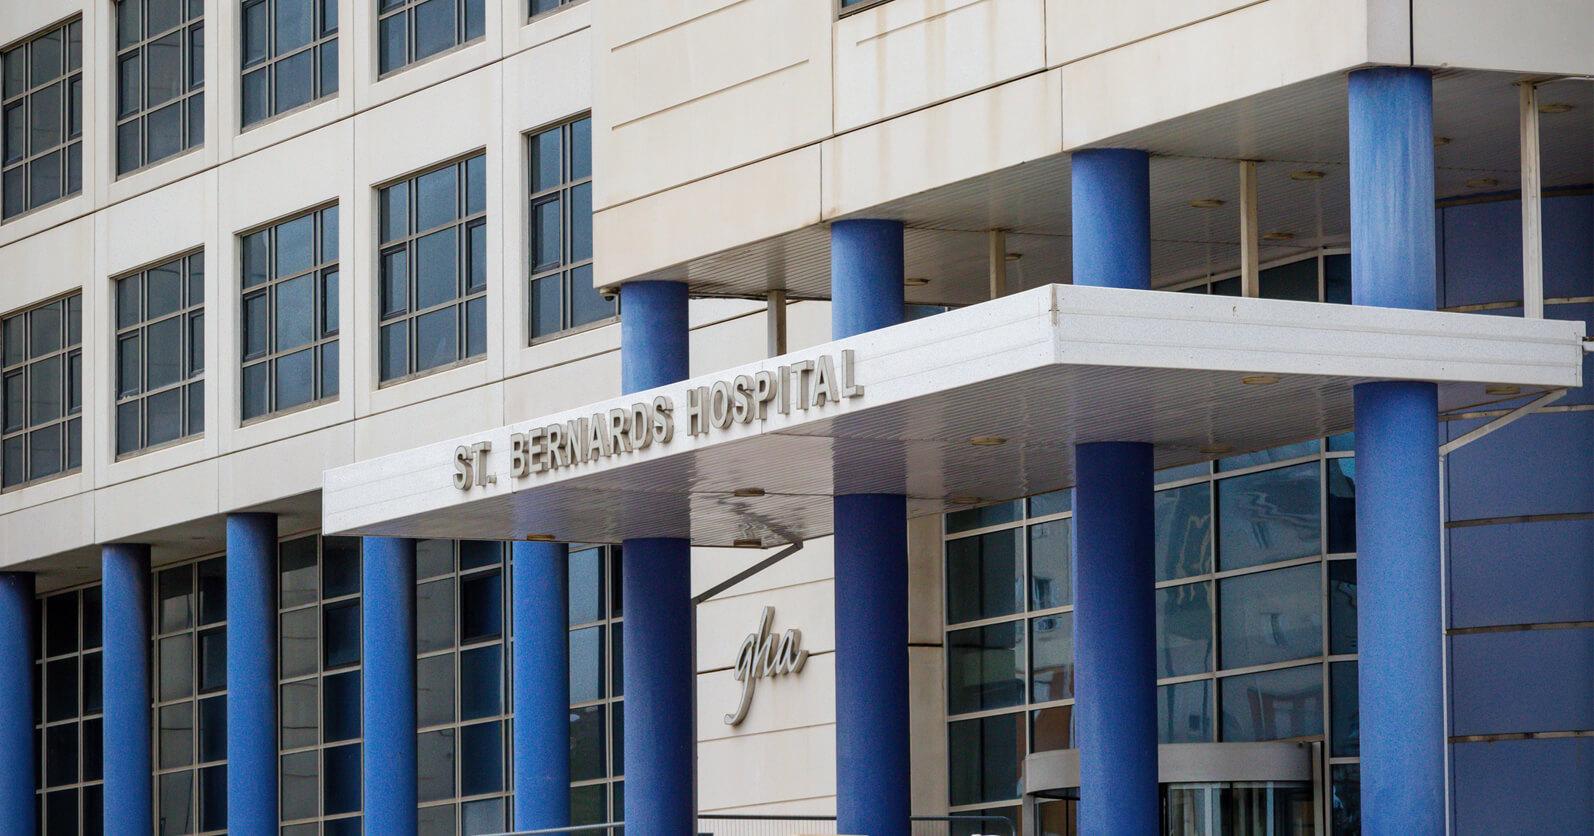 Understanding the Gibraltar healthcare system